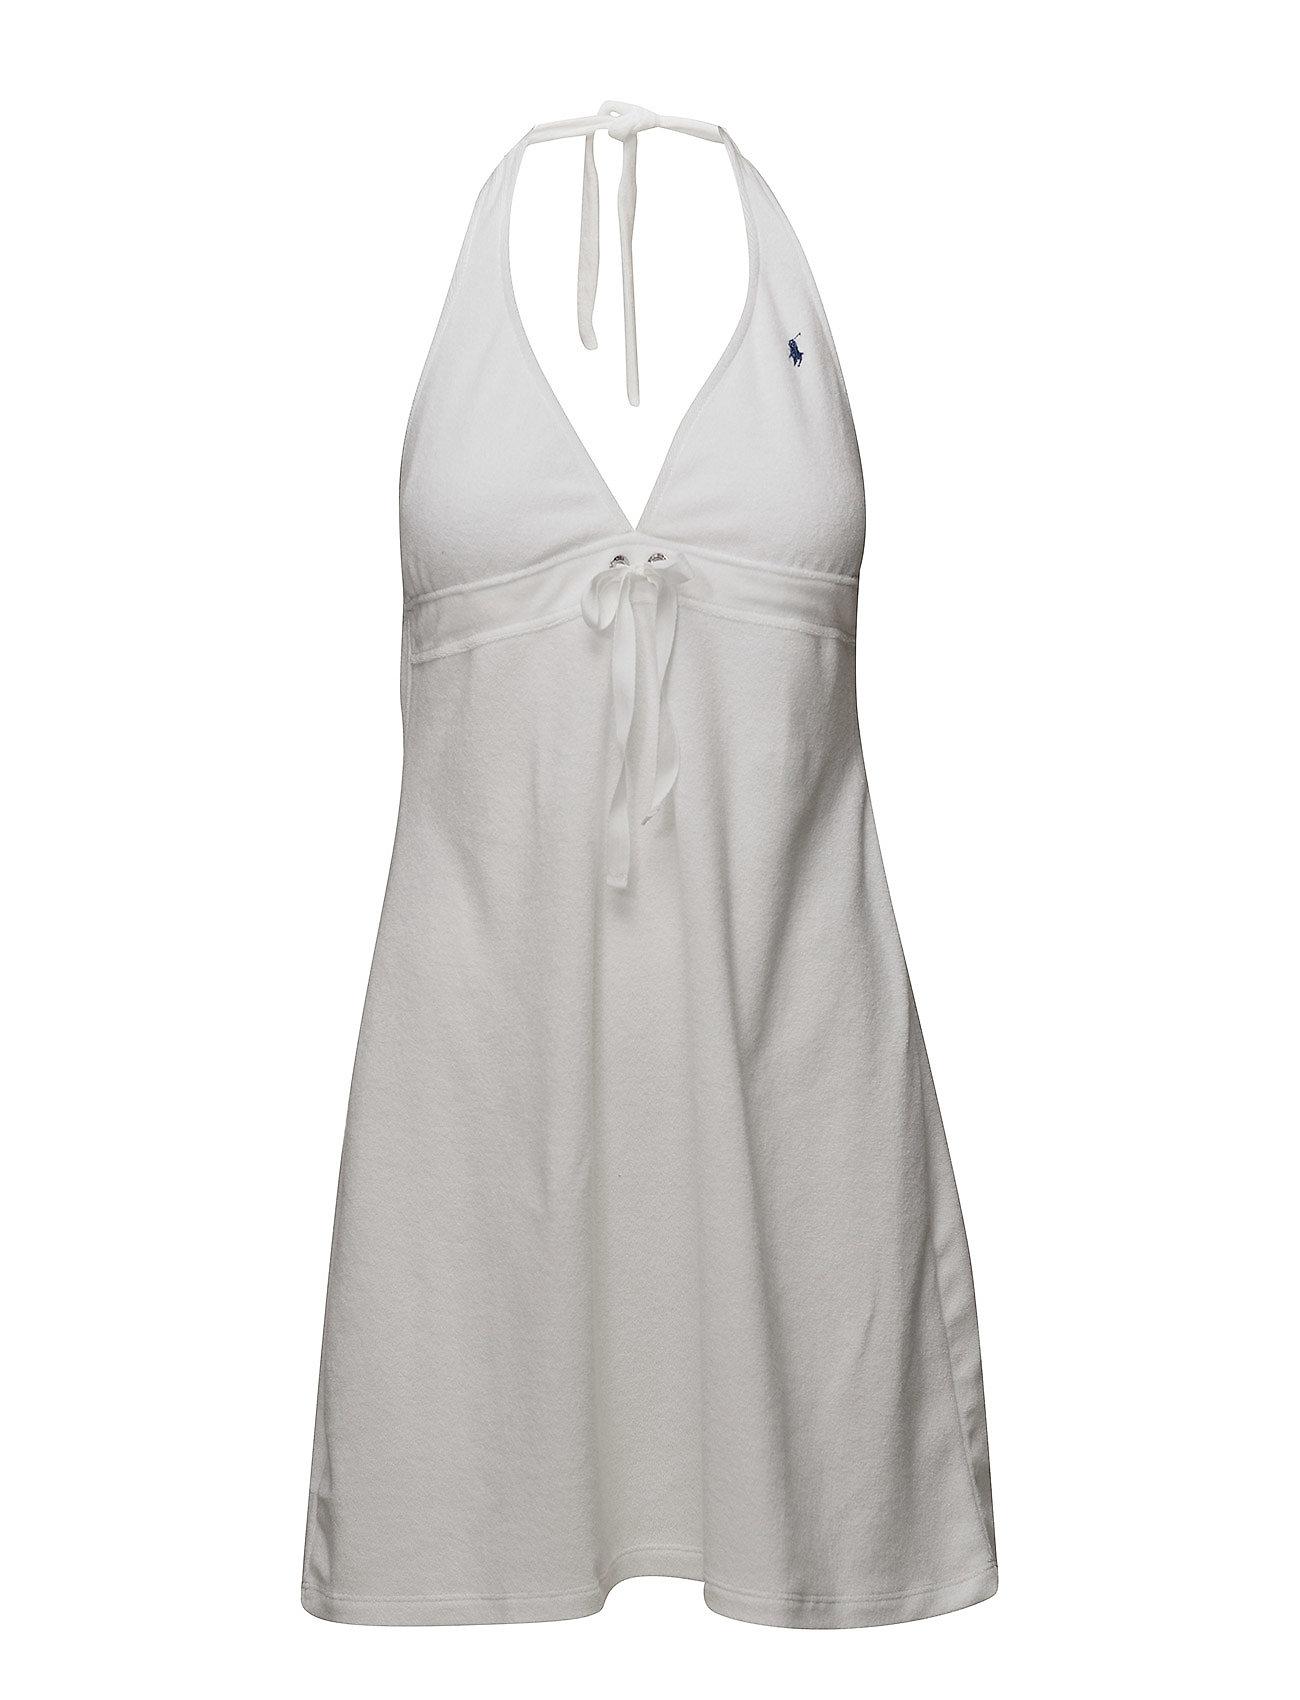 Polo Ralph Lauren Swimwear Terry Styles Grommet Halter Dress